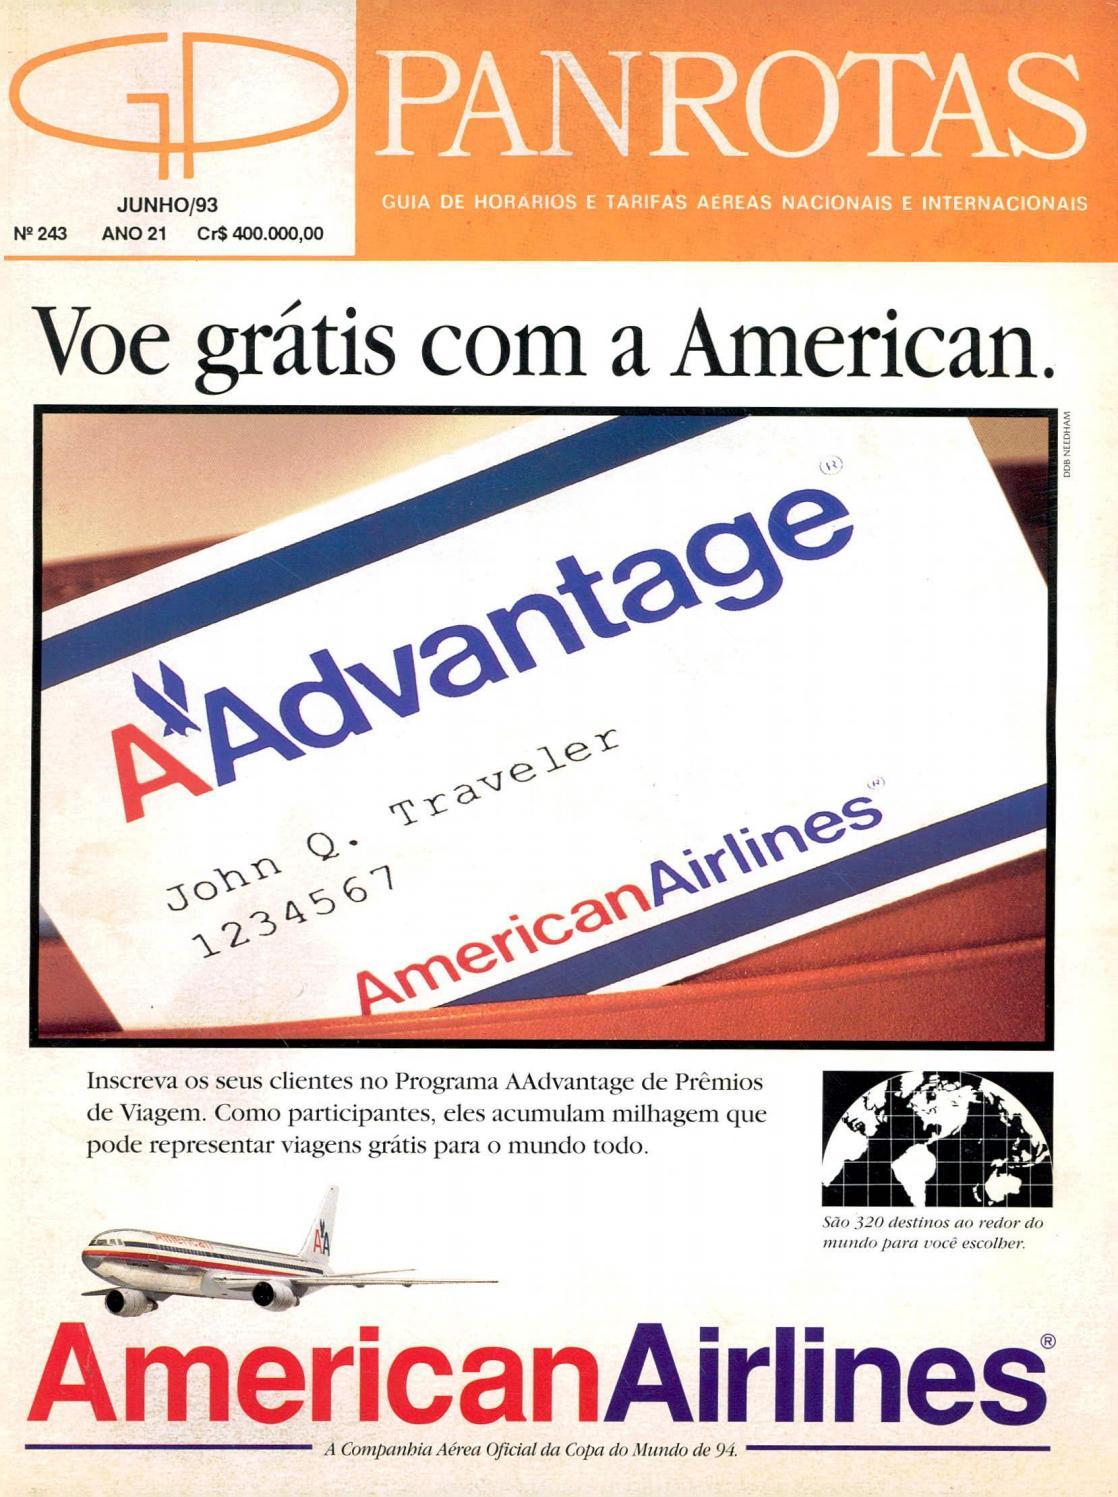 d8a039338f Guia PANROTAS - Edição 244 - Julho 1993 by PANROTAS Editora - issuu